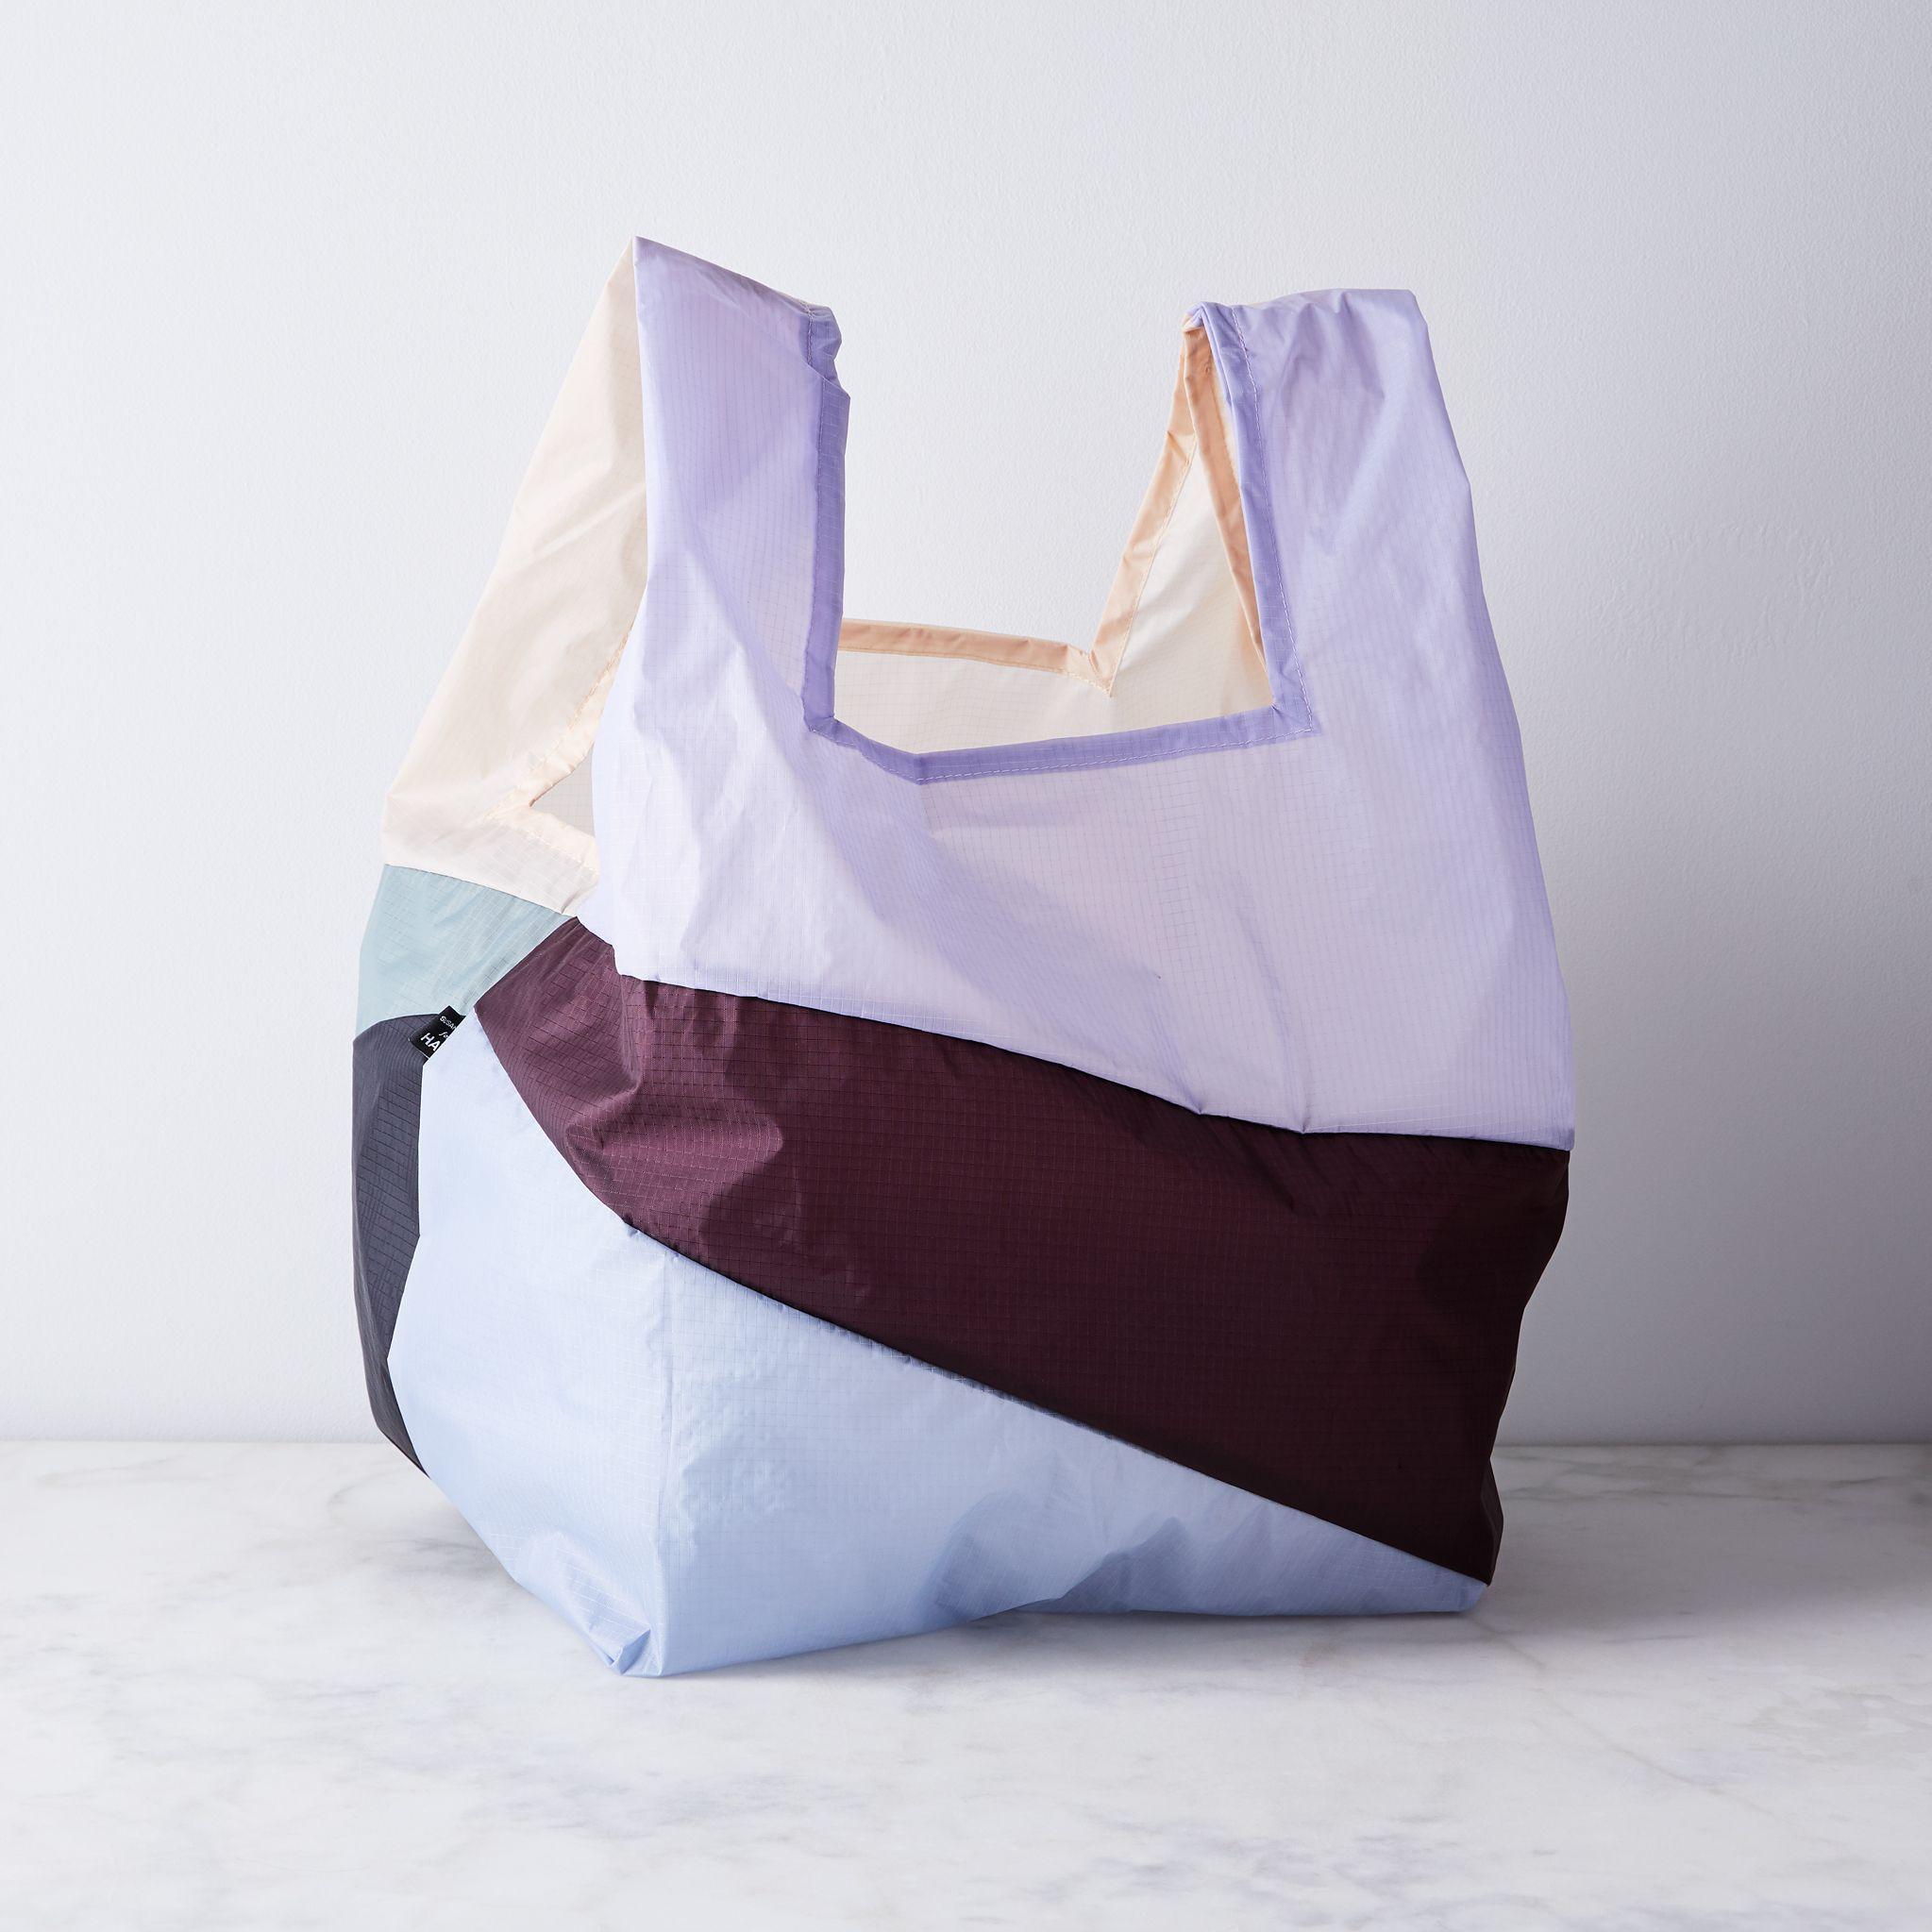 HAY Six Color Reusable Grocery Bag - No. 2 Faded Neutrals